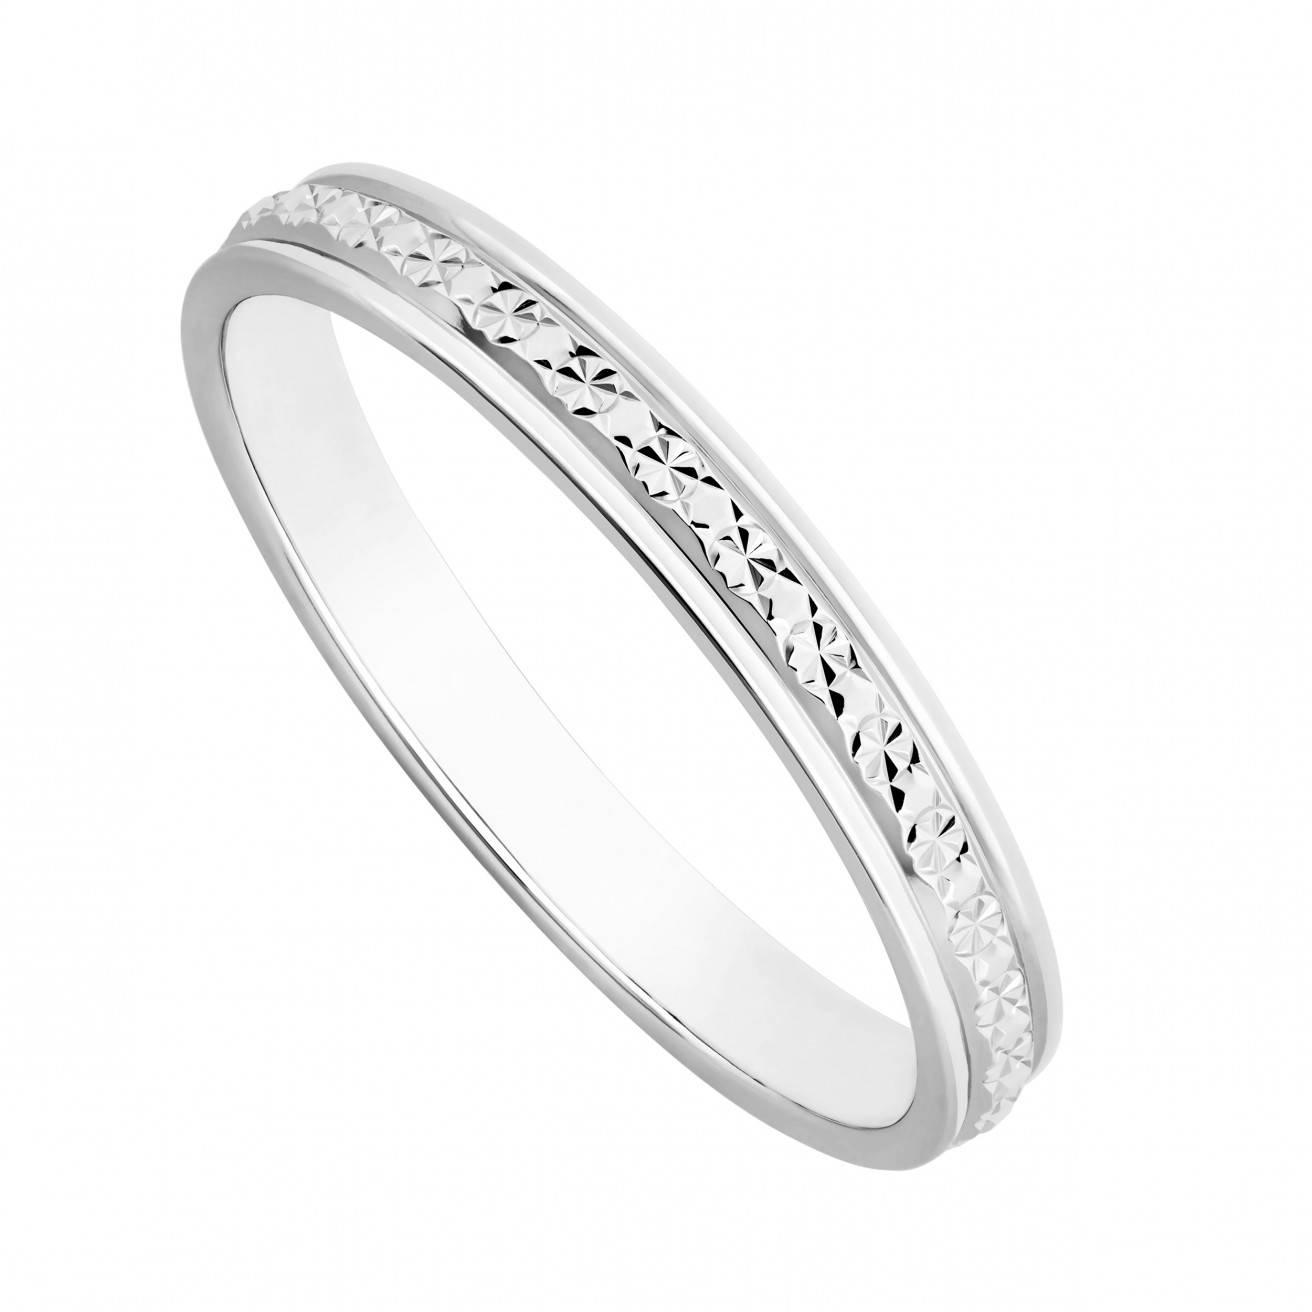 Buy A Diamond Wedding Ring Online – Fraser Hart Regarding Diamonds Wedding Rings (View 5 of 15)